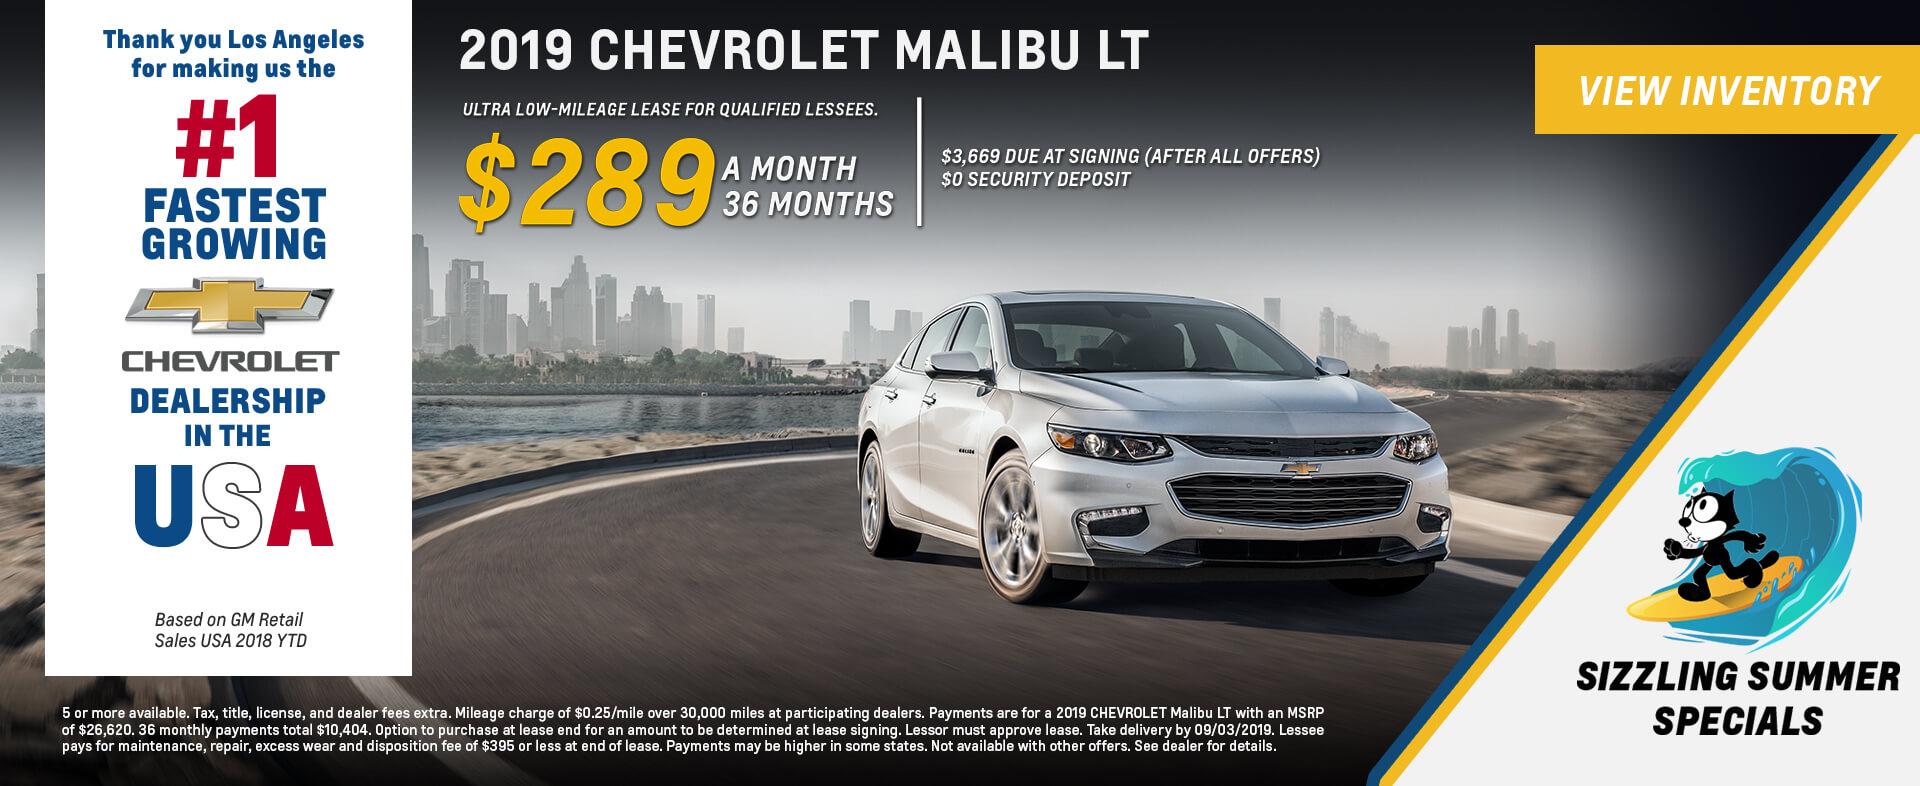 New & Used Chevrolet Dealer - Los Angeles, Glendale, Pasadena